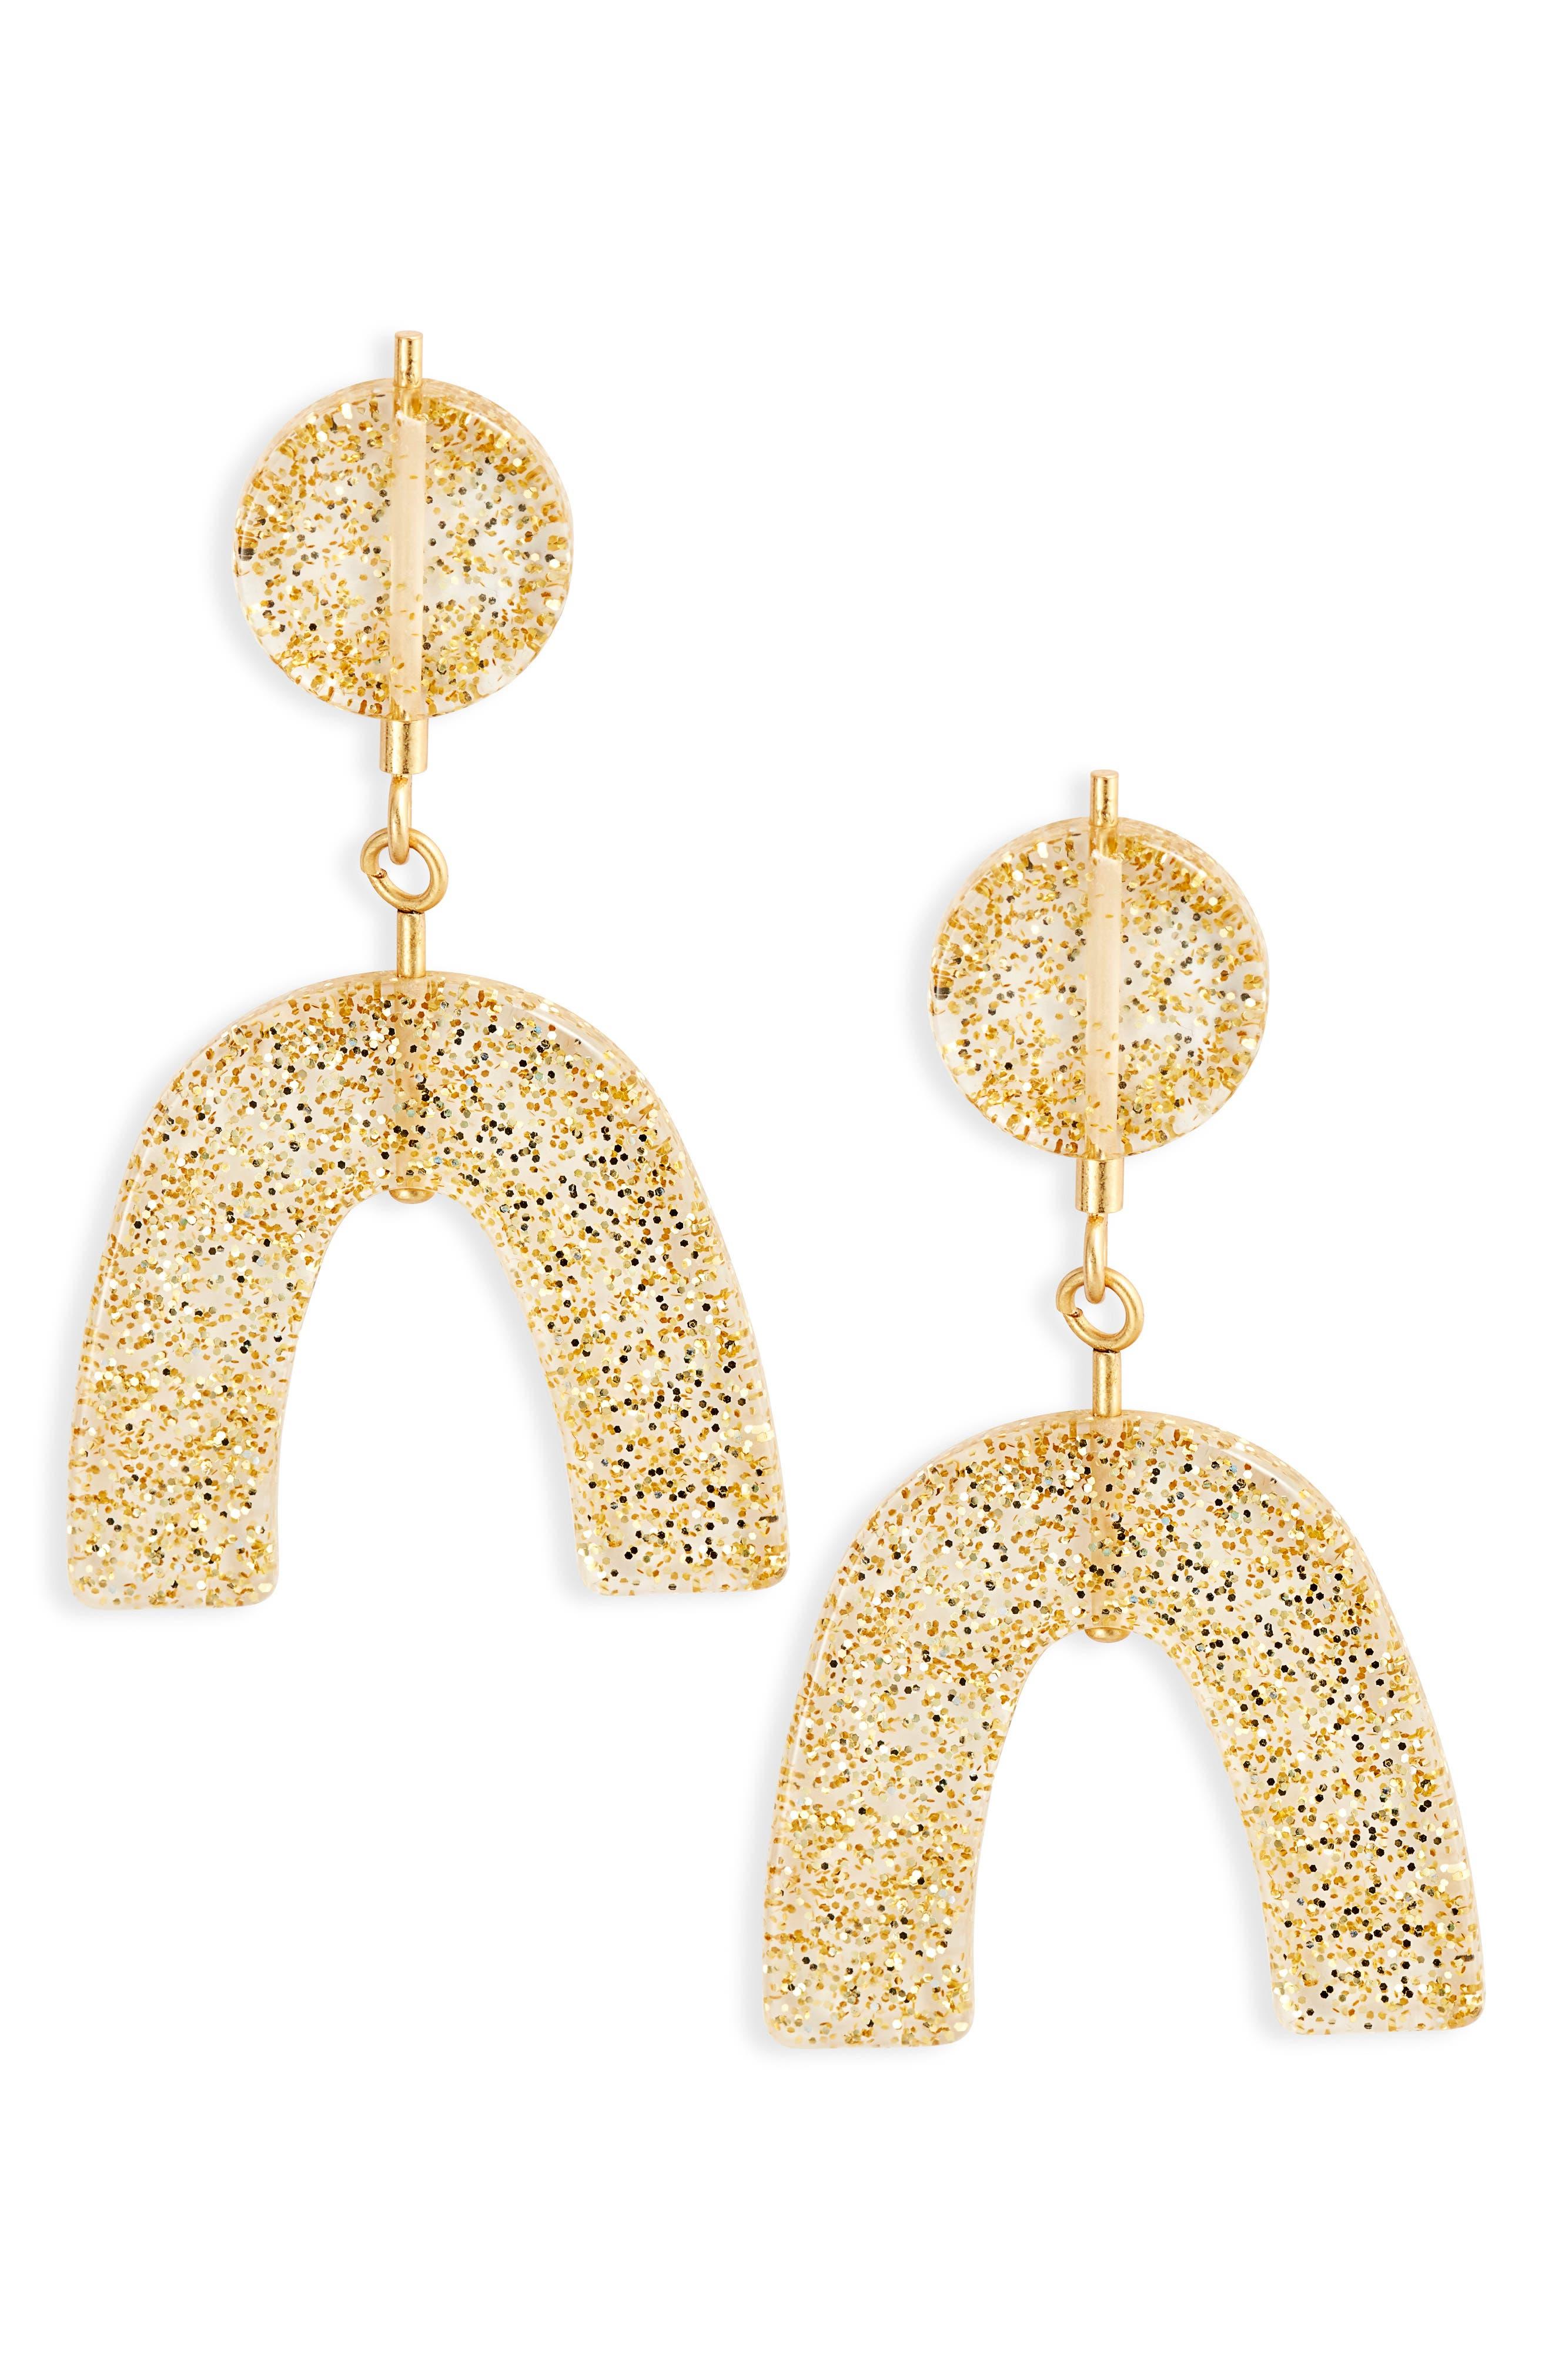 Glitter Shapes Statement Earrings,                         Main,                         color, GOLD GLITTER